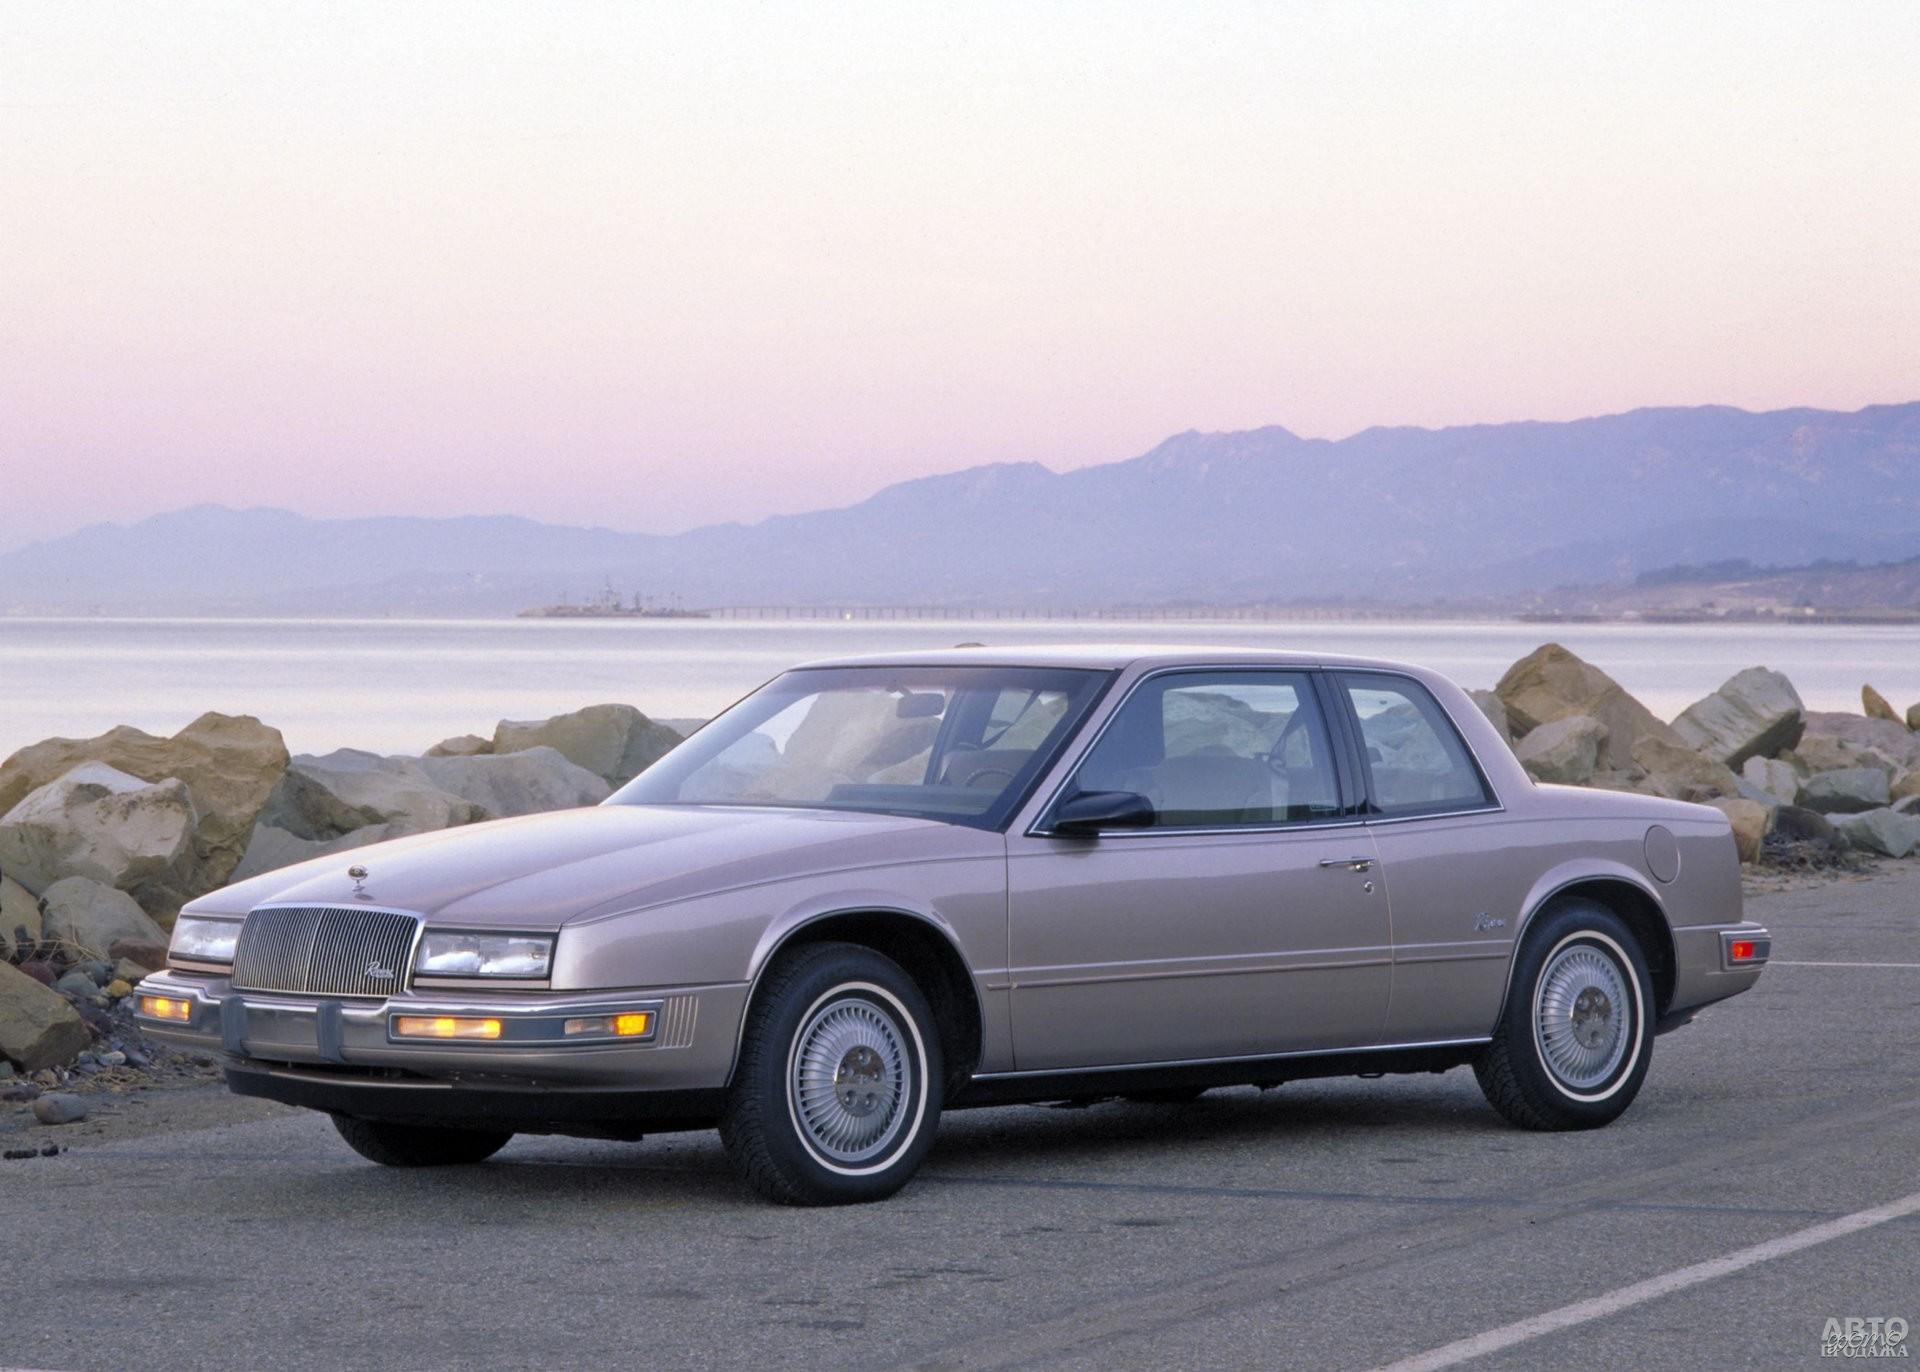 В 1986 году длину Buick Riviera уменьшили до 4,8 м